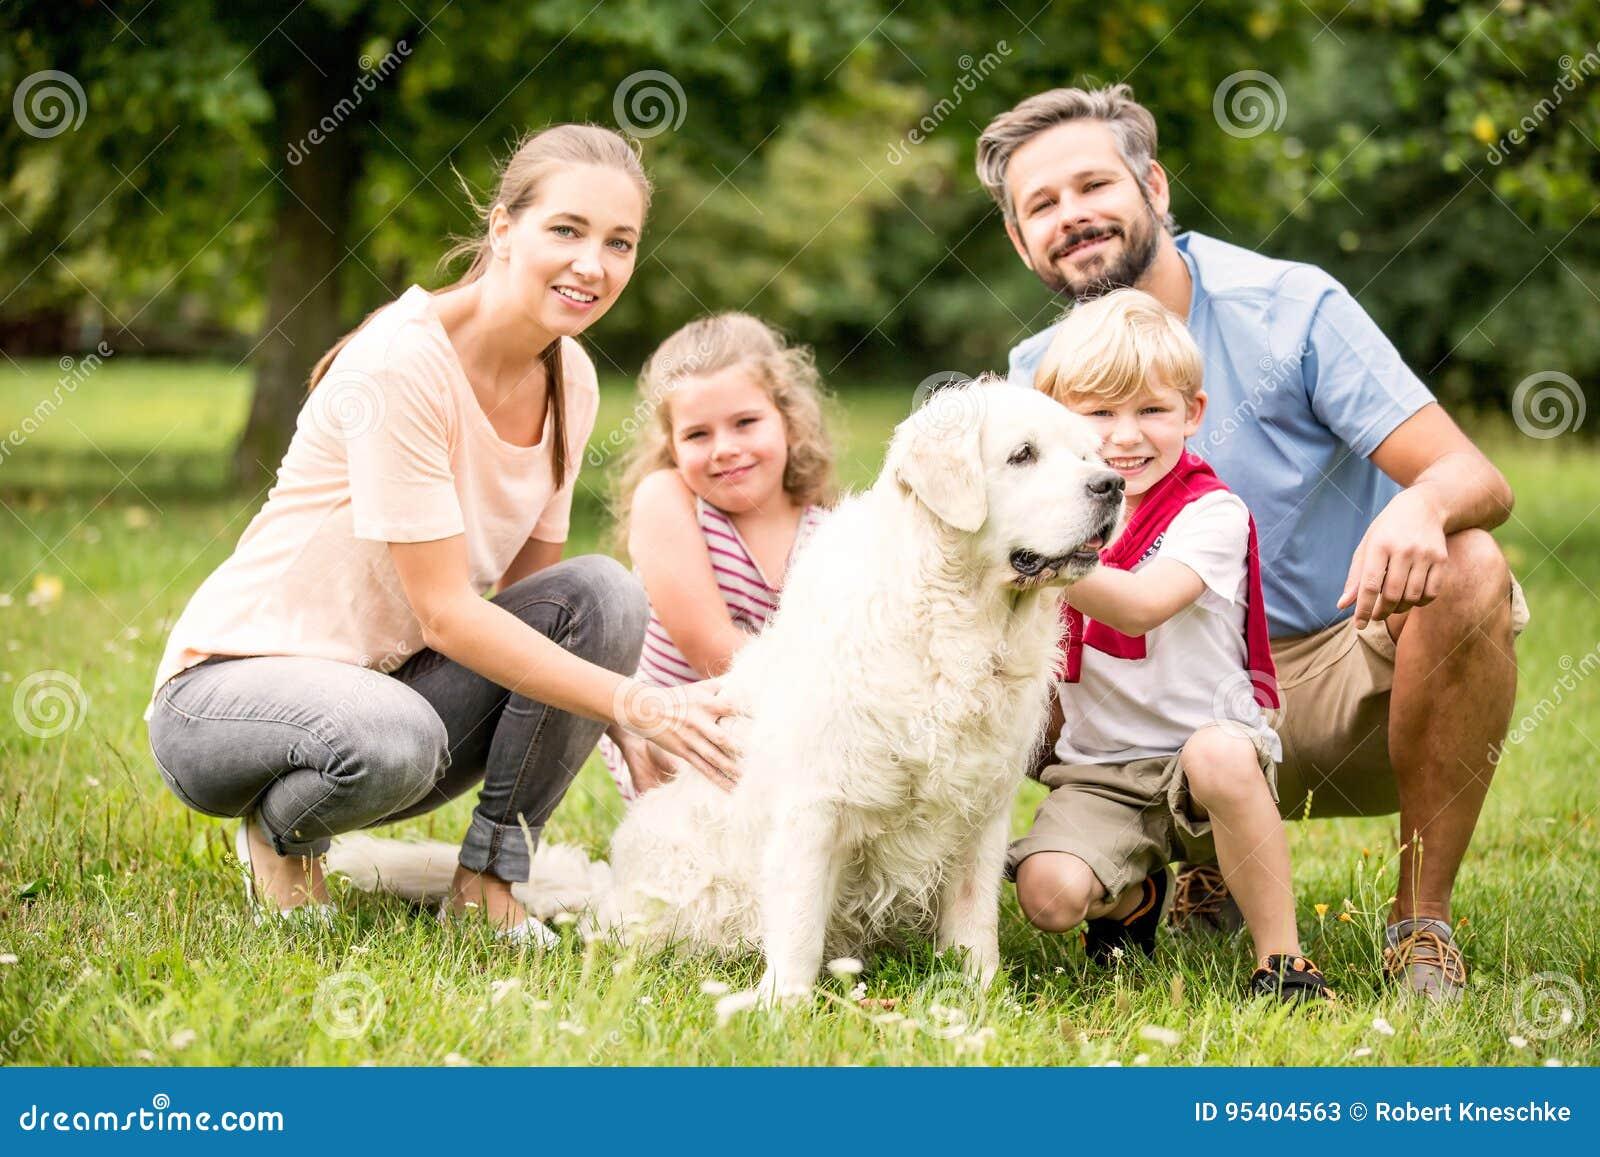 gl ckliche familie mit kindern und hund stockbild bild. Black Bedroom Furniture Sets. Home Design Ideas